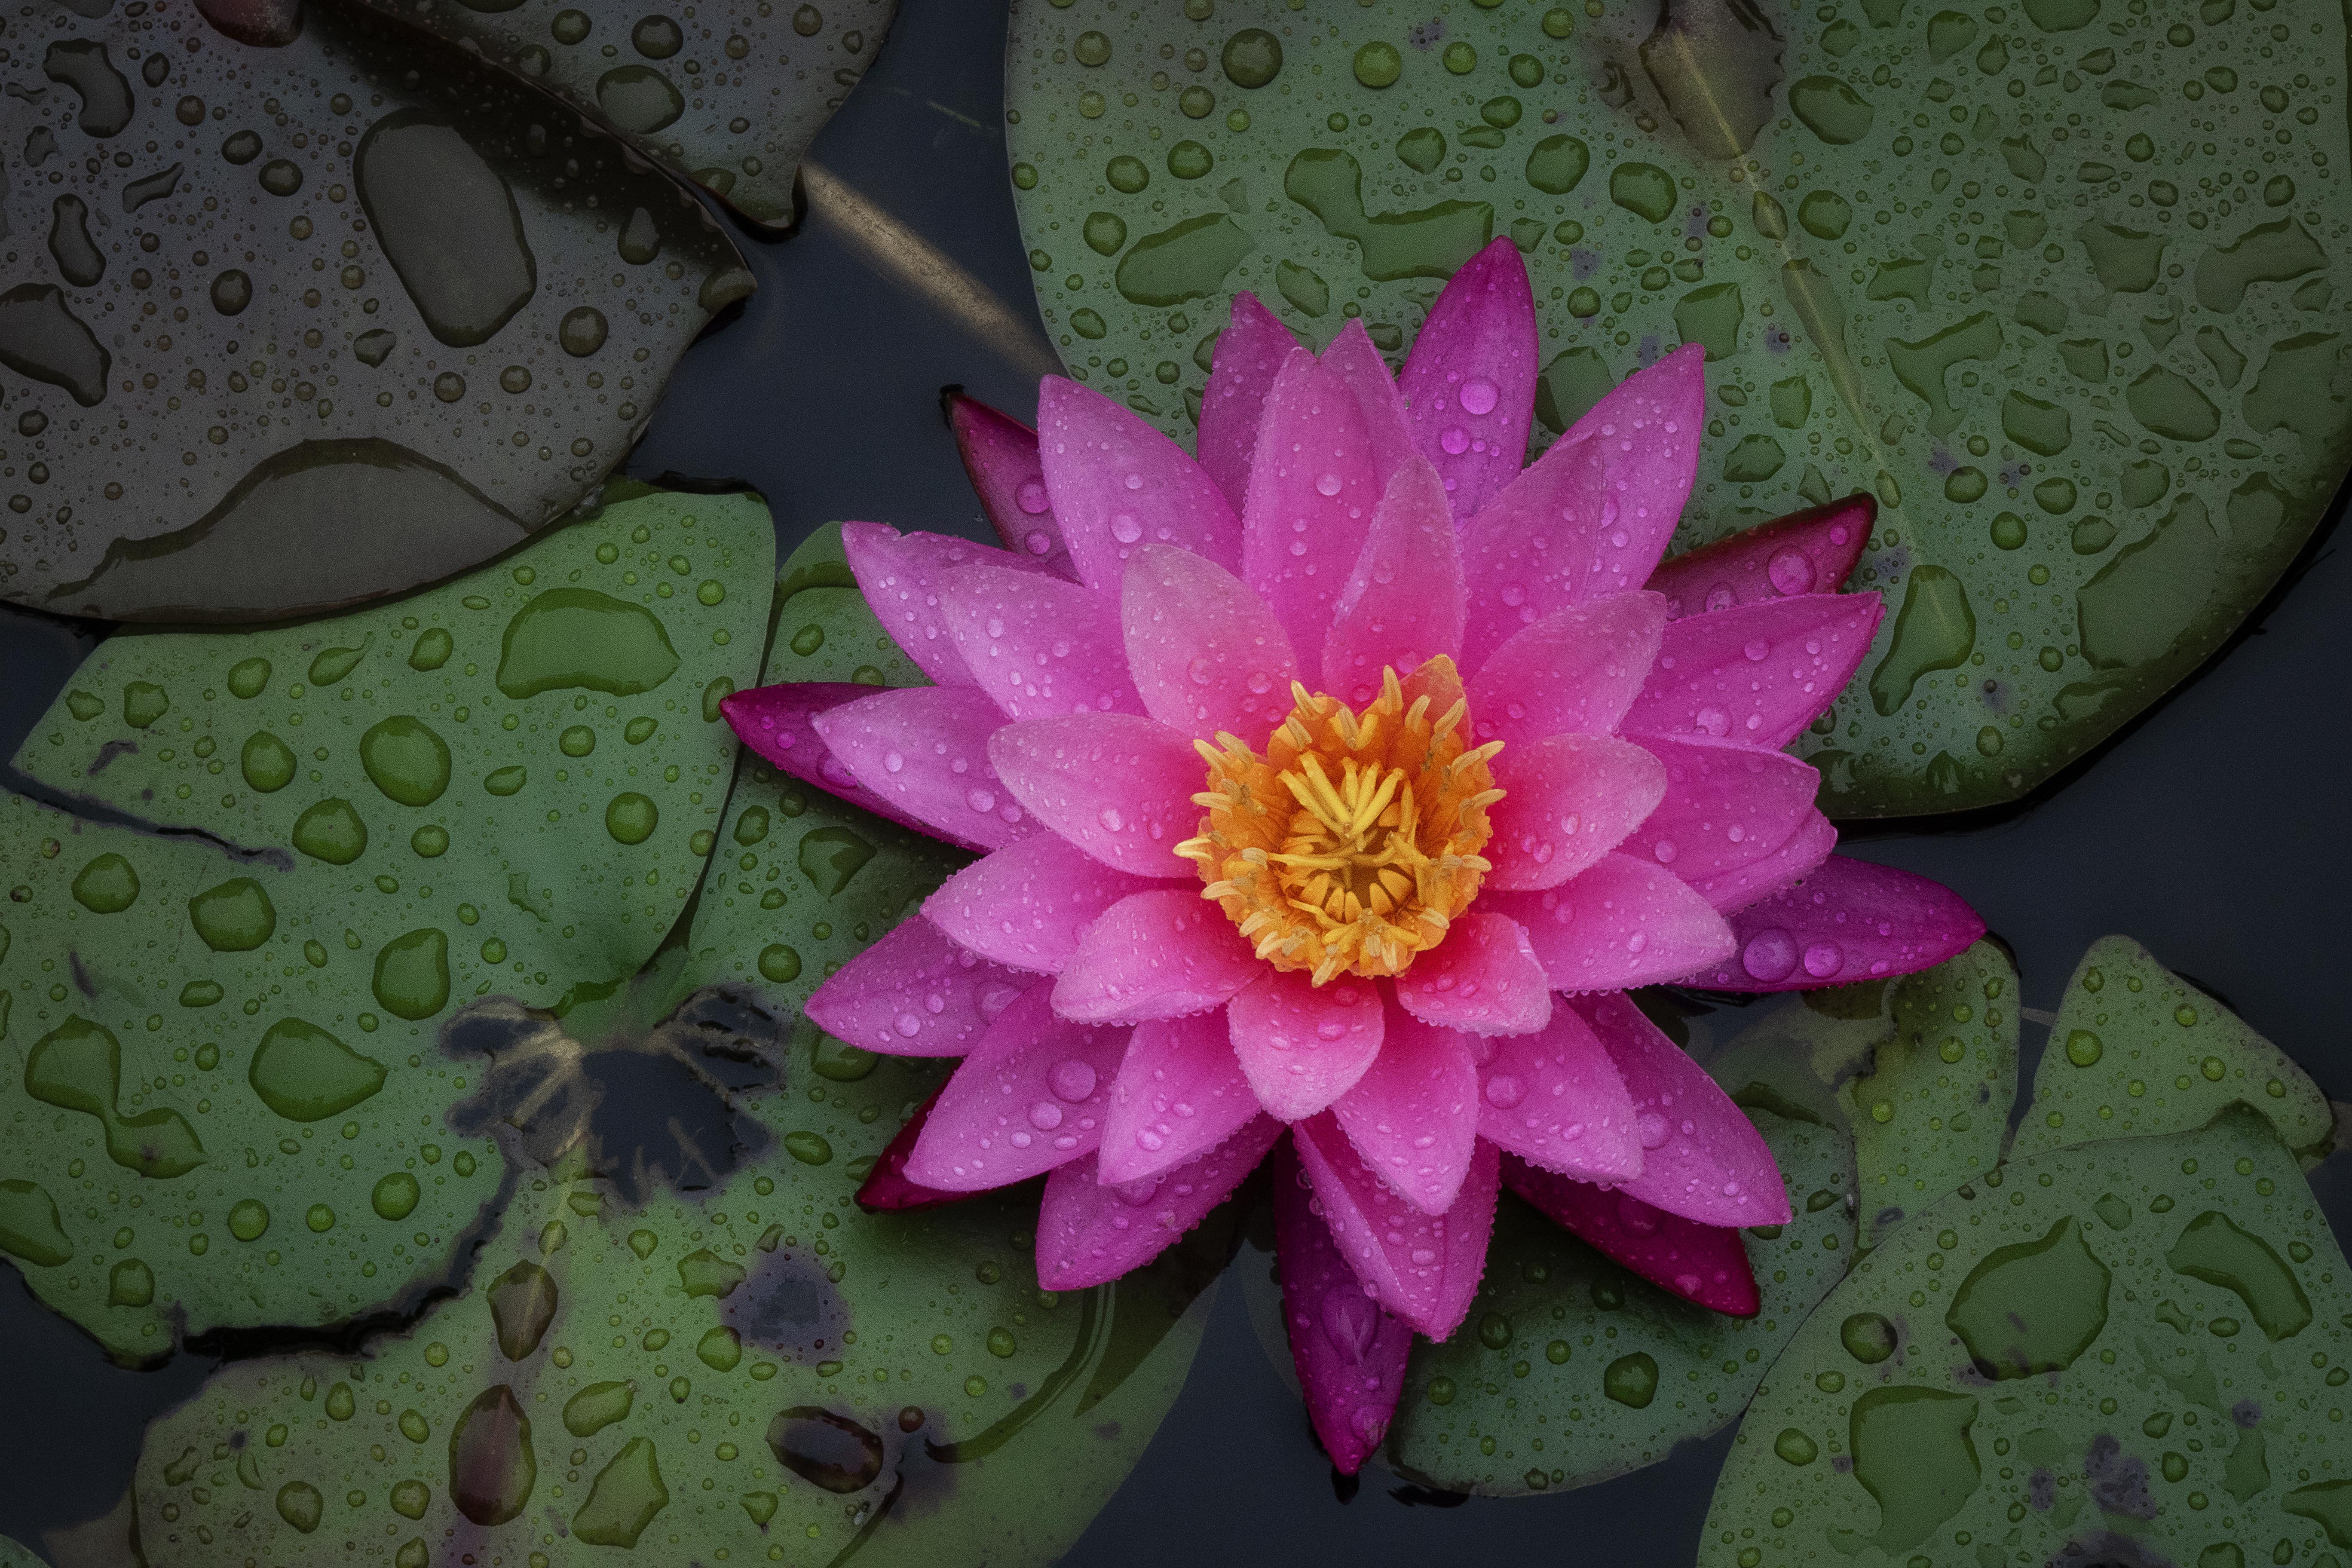 Lotus Blossom In The Rain